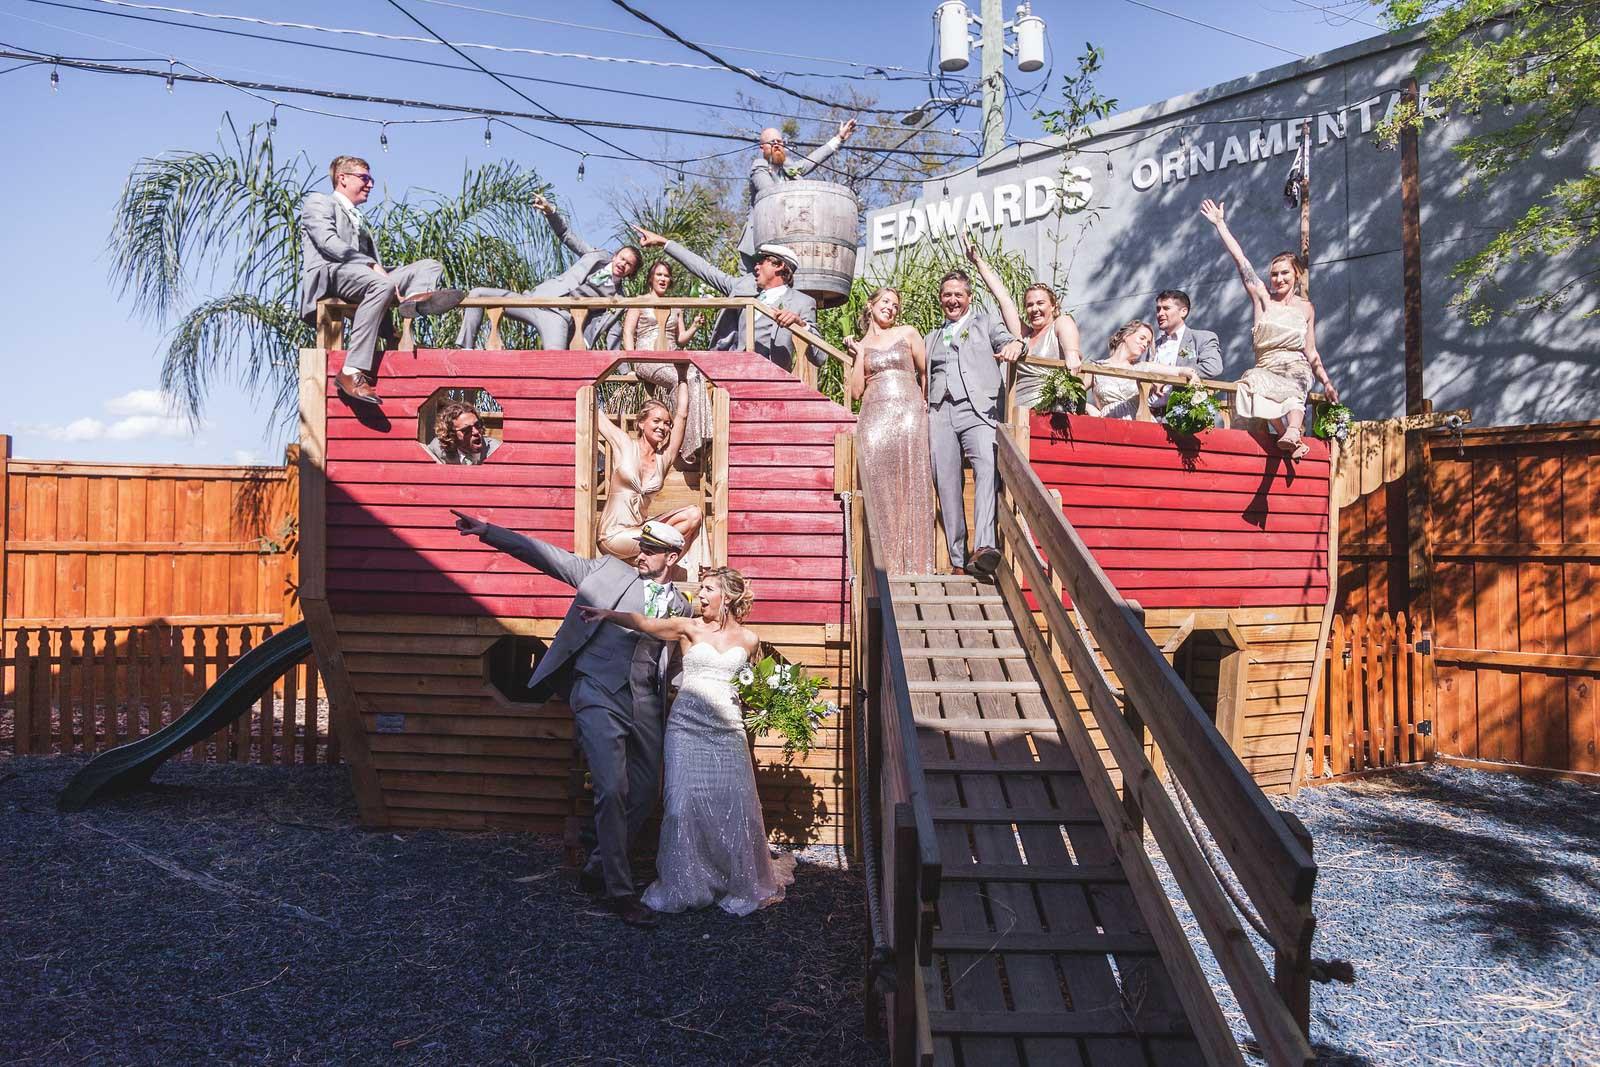 The-Glass-Factory-Wedding-Photographer-Adam-Szarmack-46.jpg